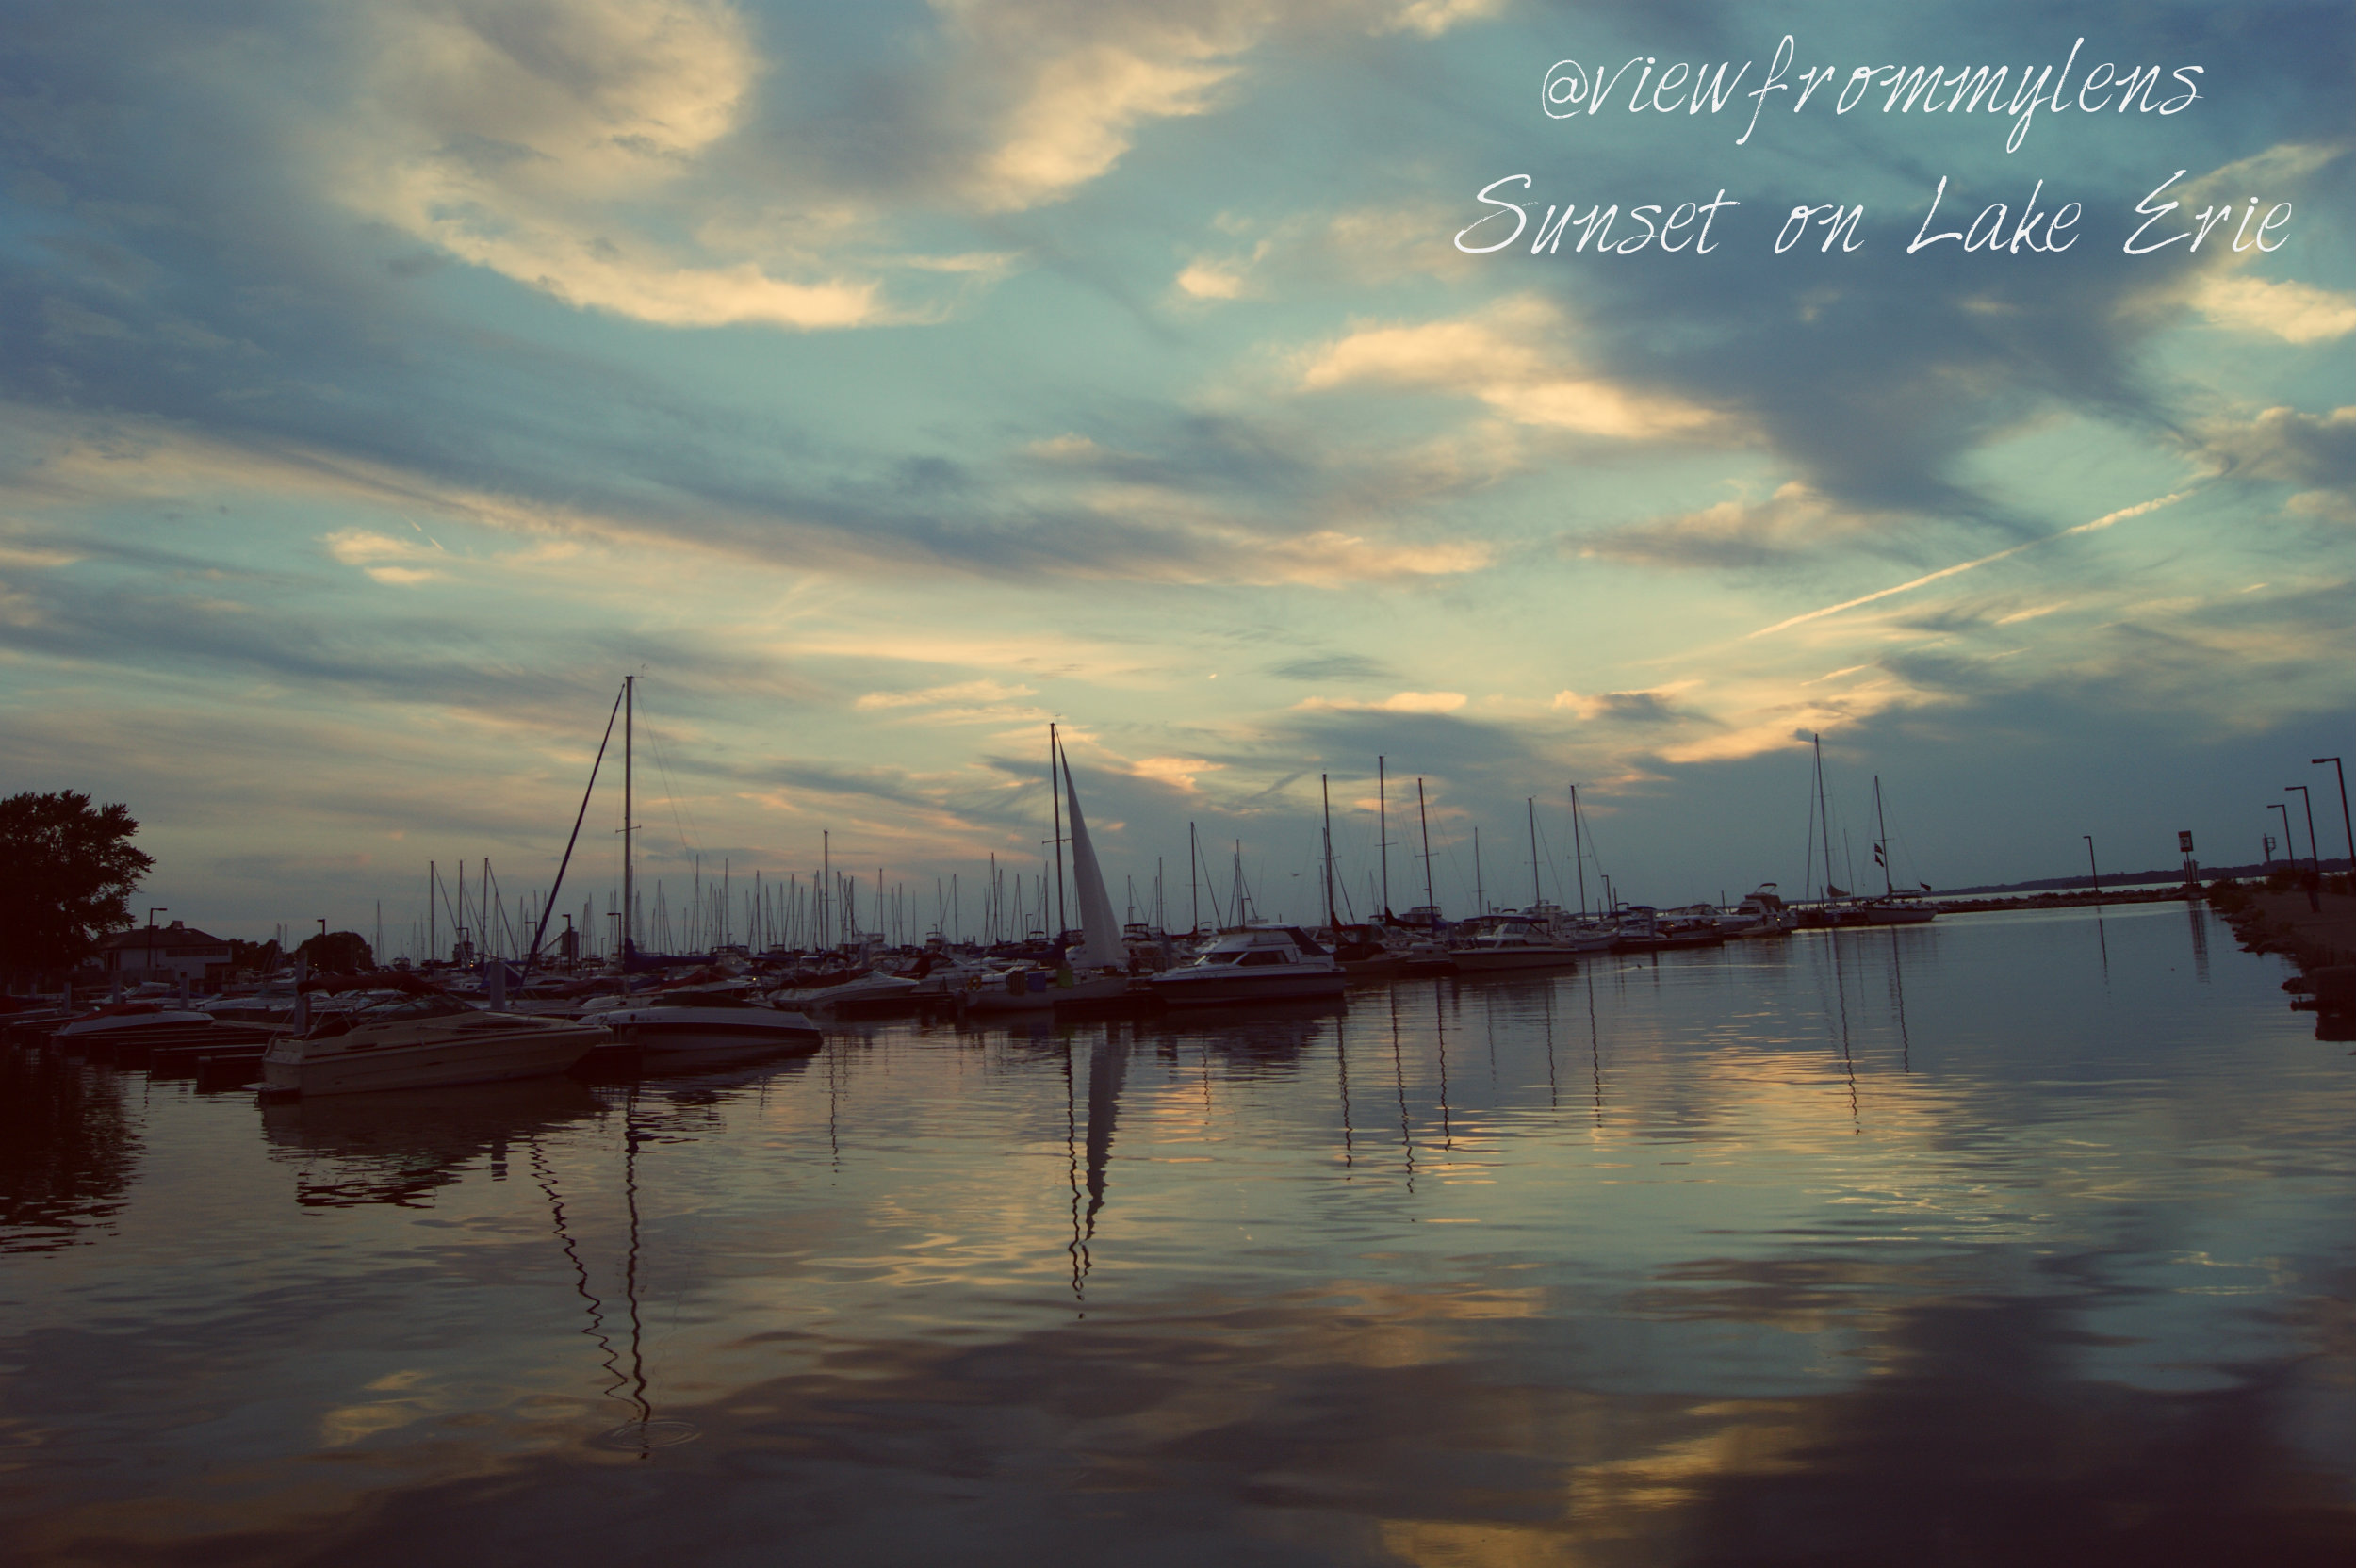 Sunset on Lake Erie #186